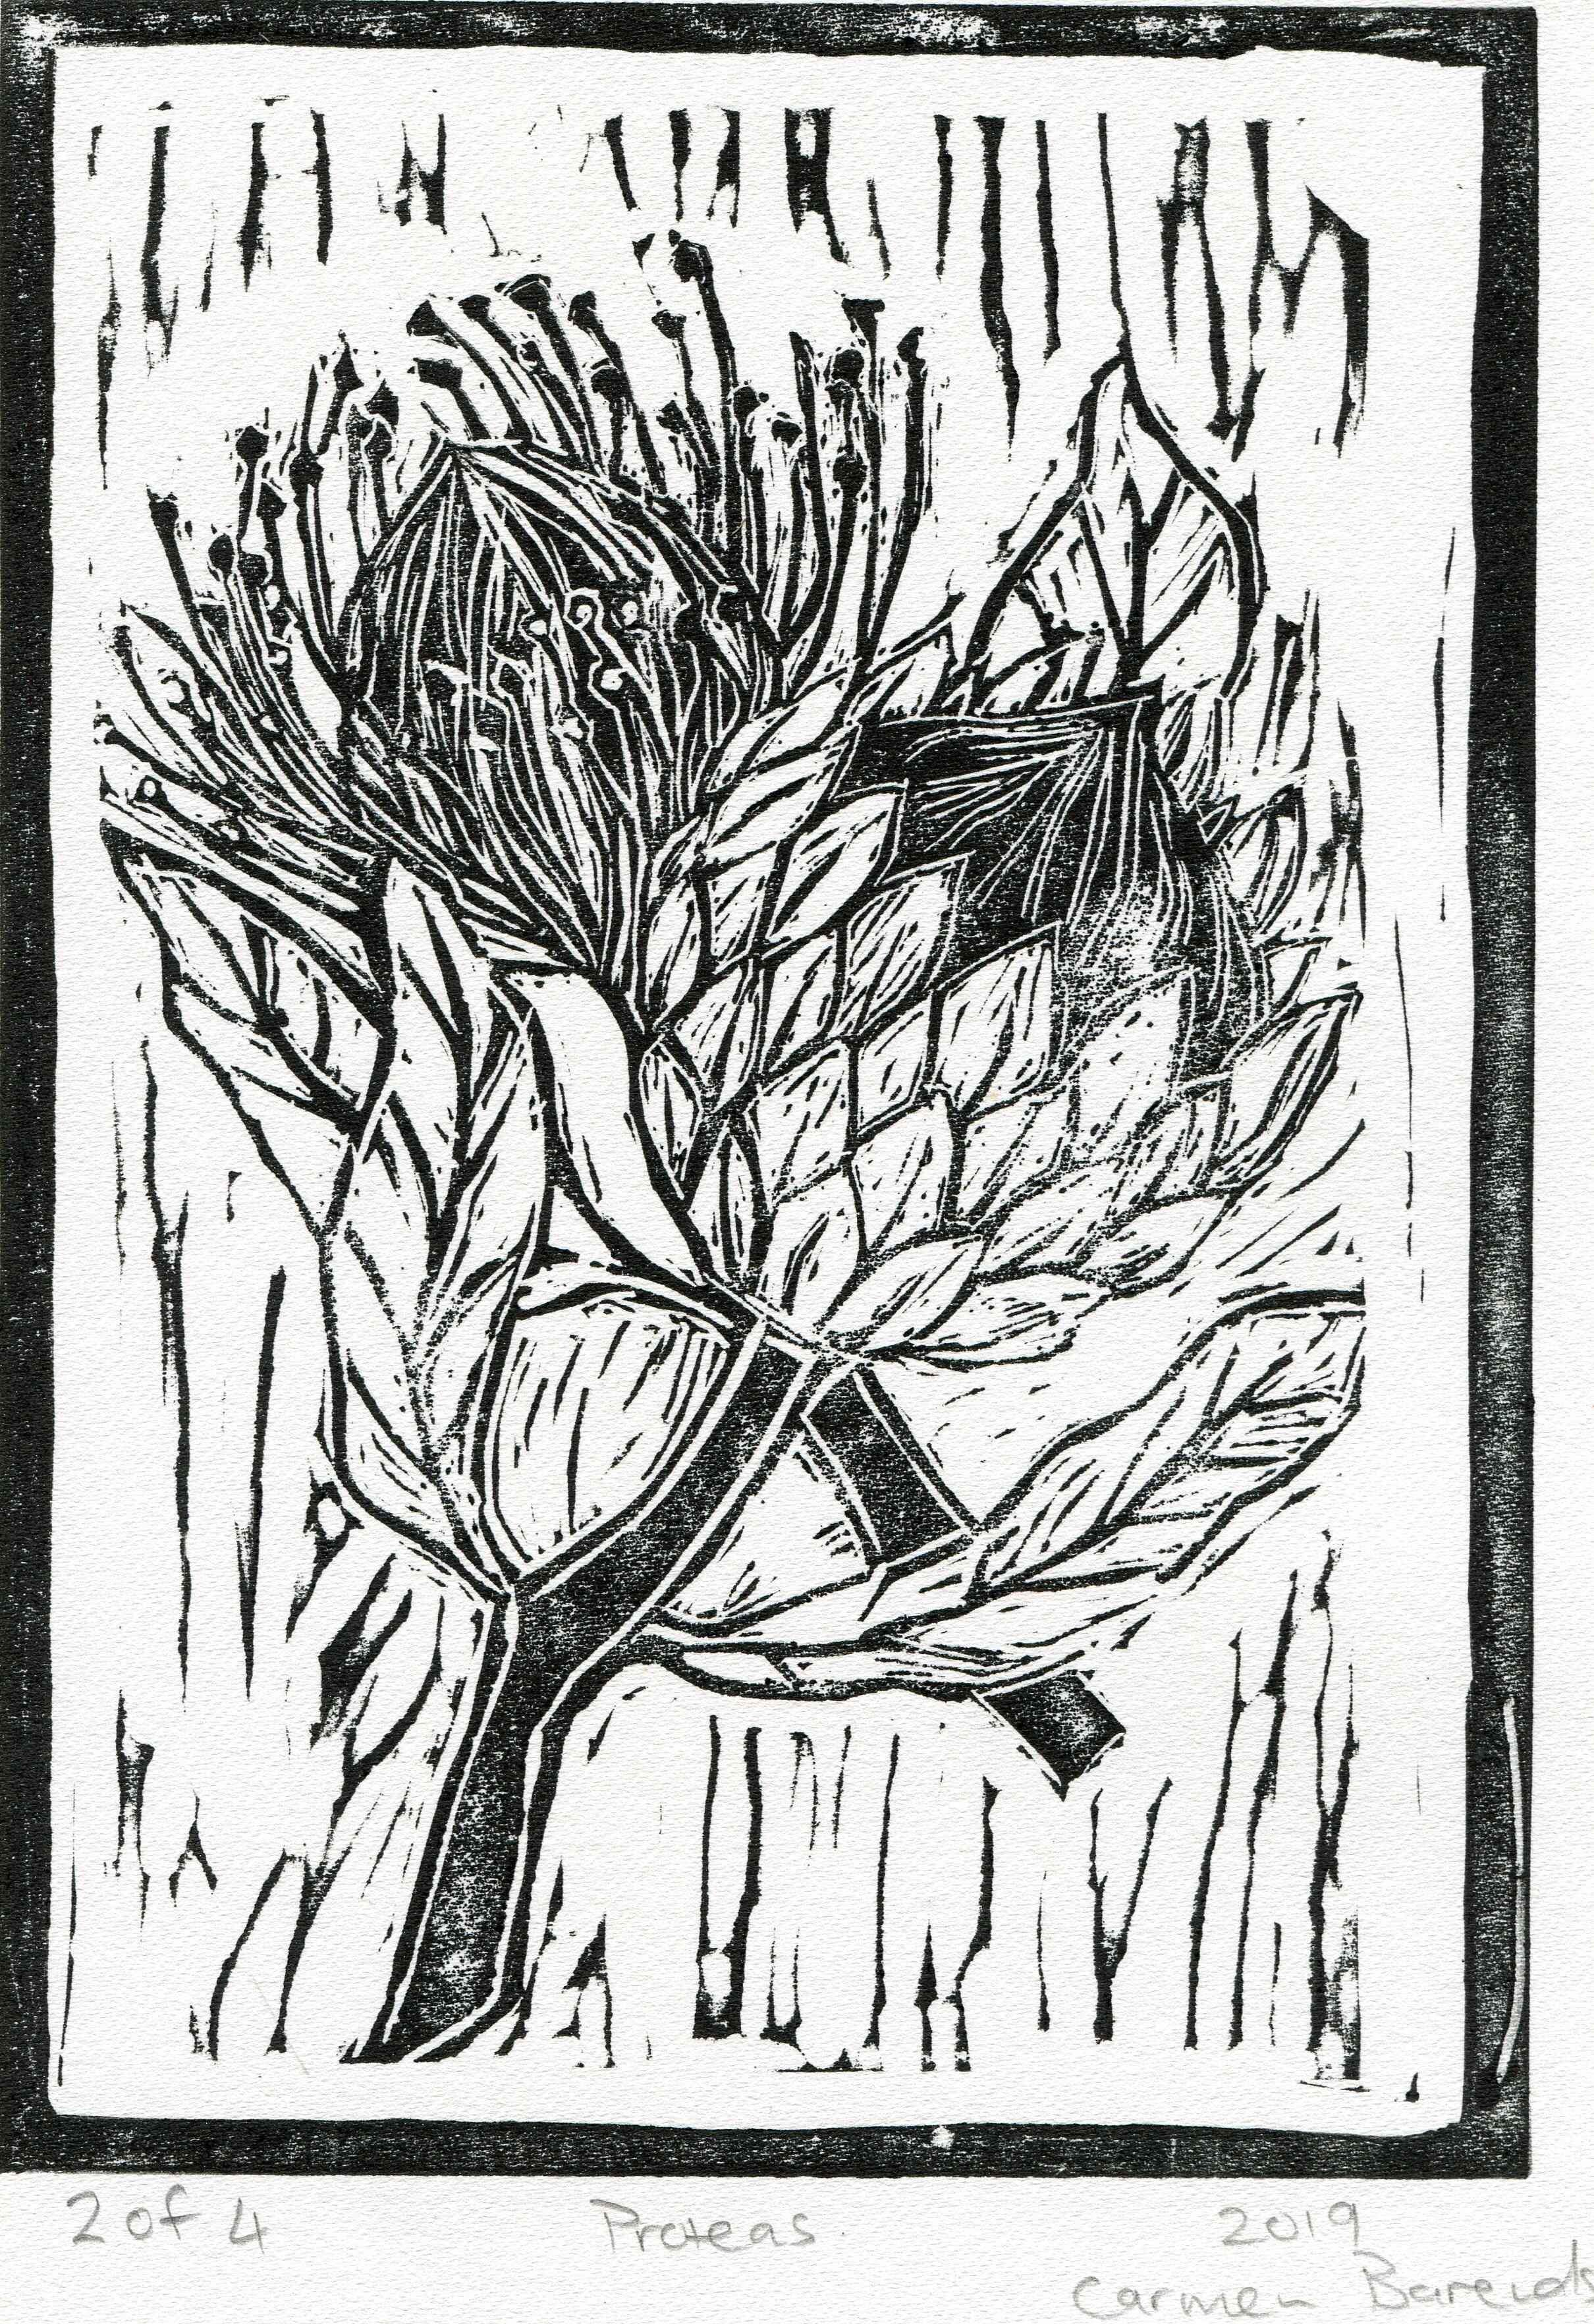 31b  Carmen Barends  Proteas  linocut print on paper